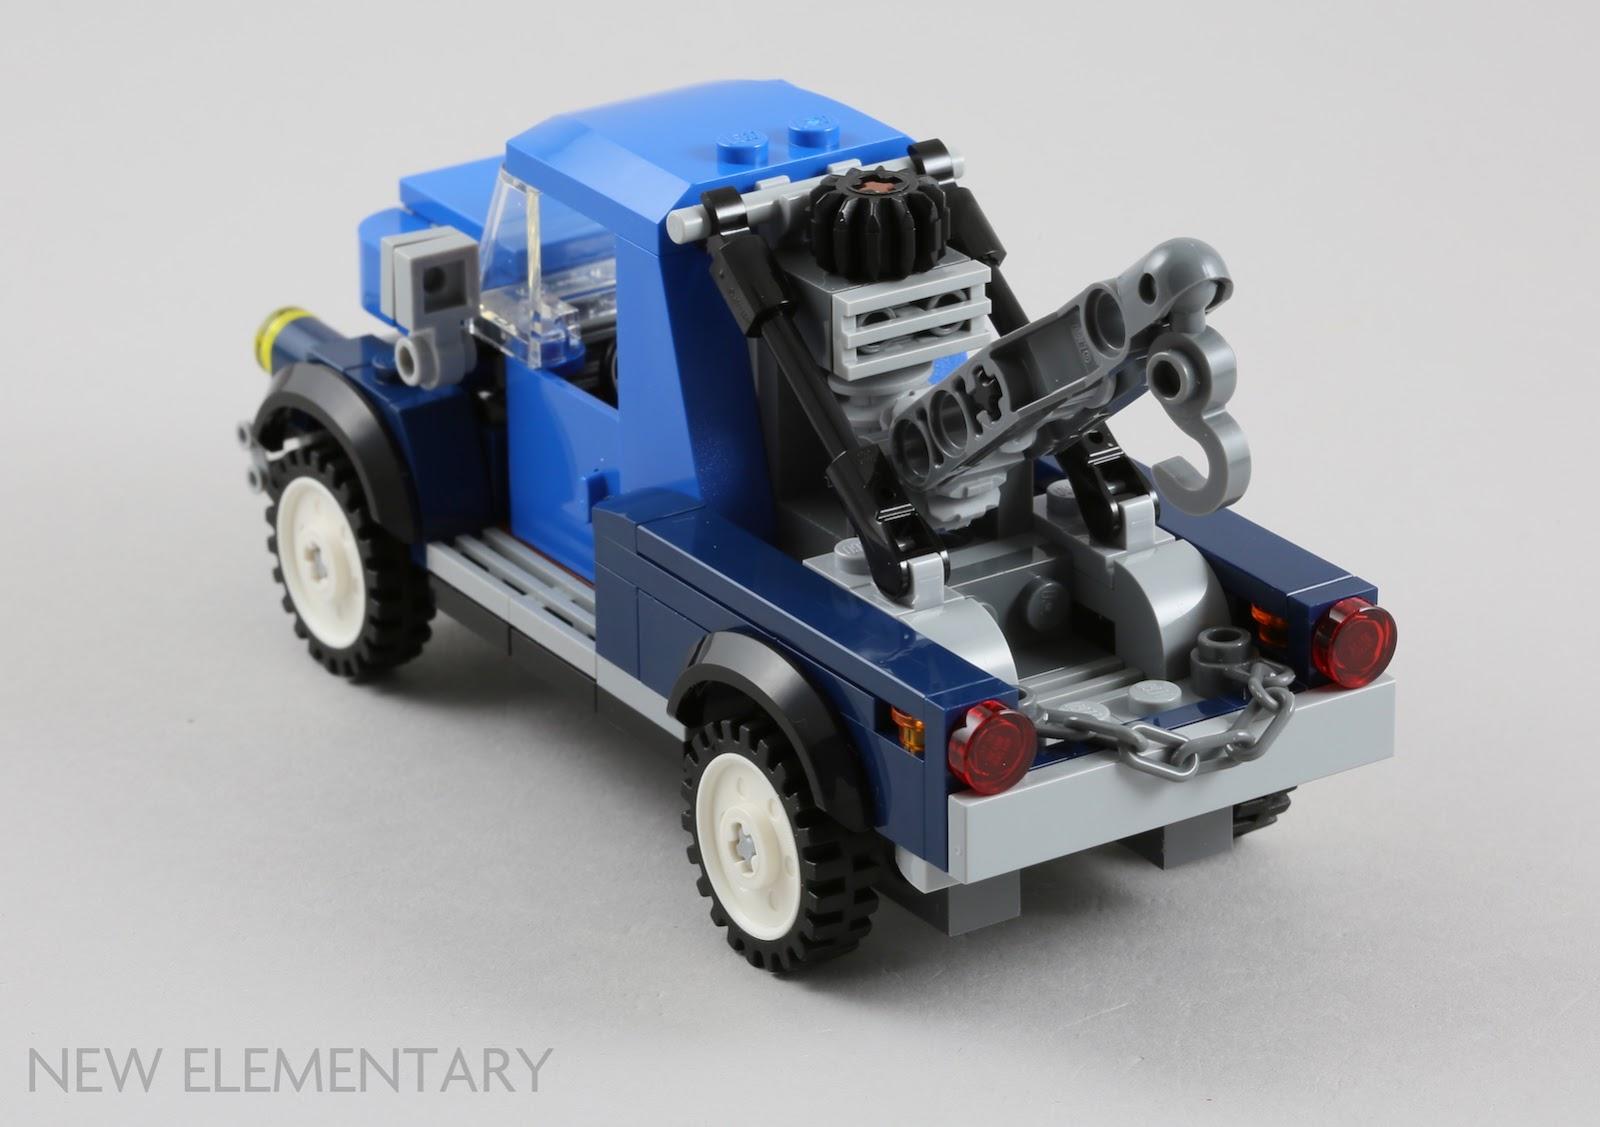 LEGO Lot of 4 Light Gray 2x2 Cart Wheel Plates